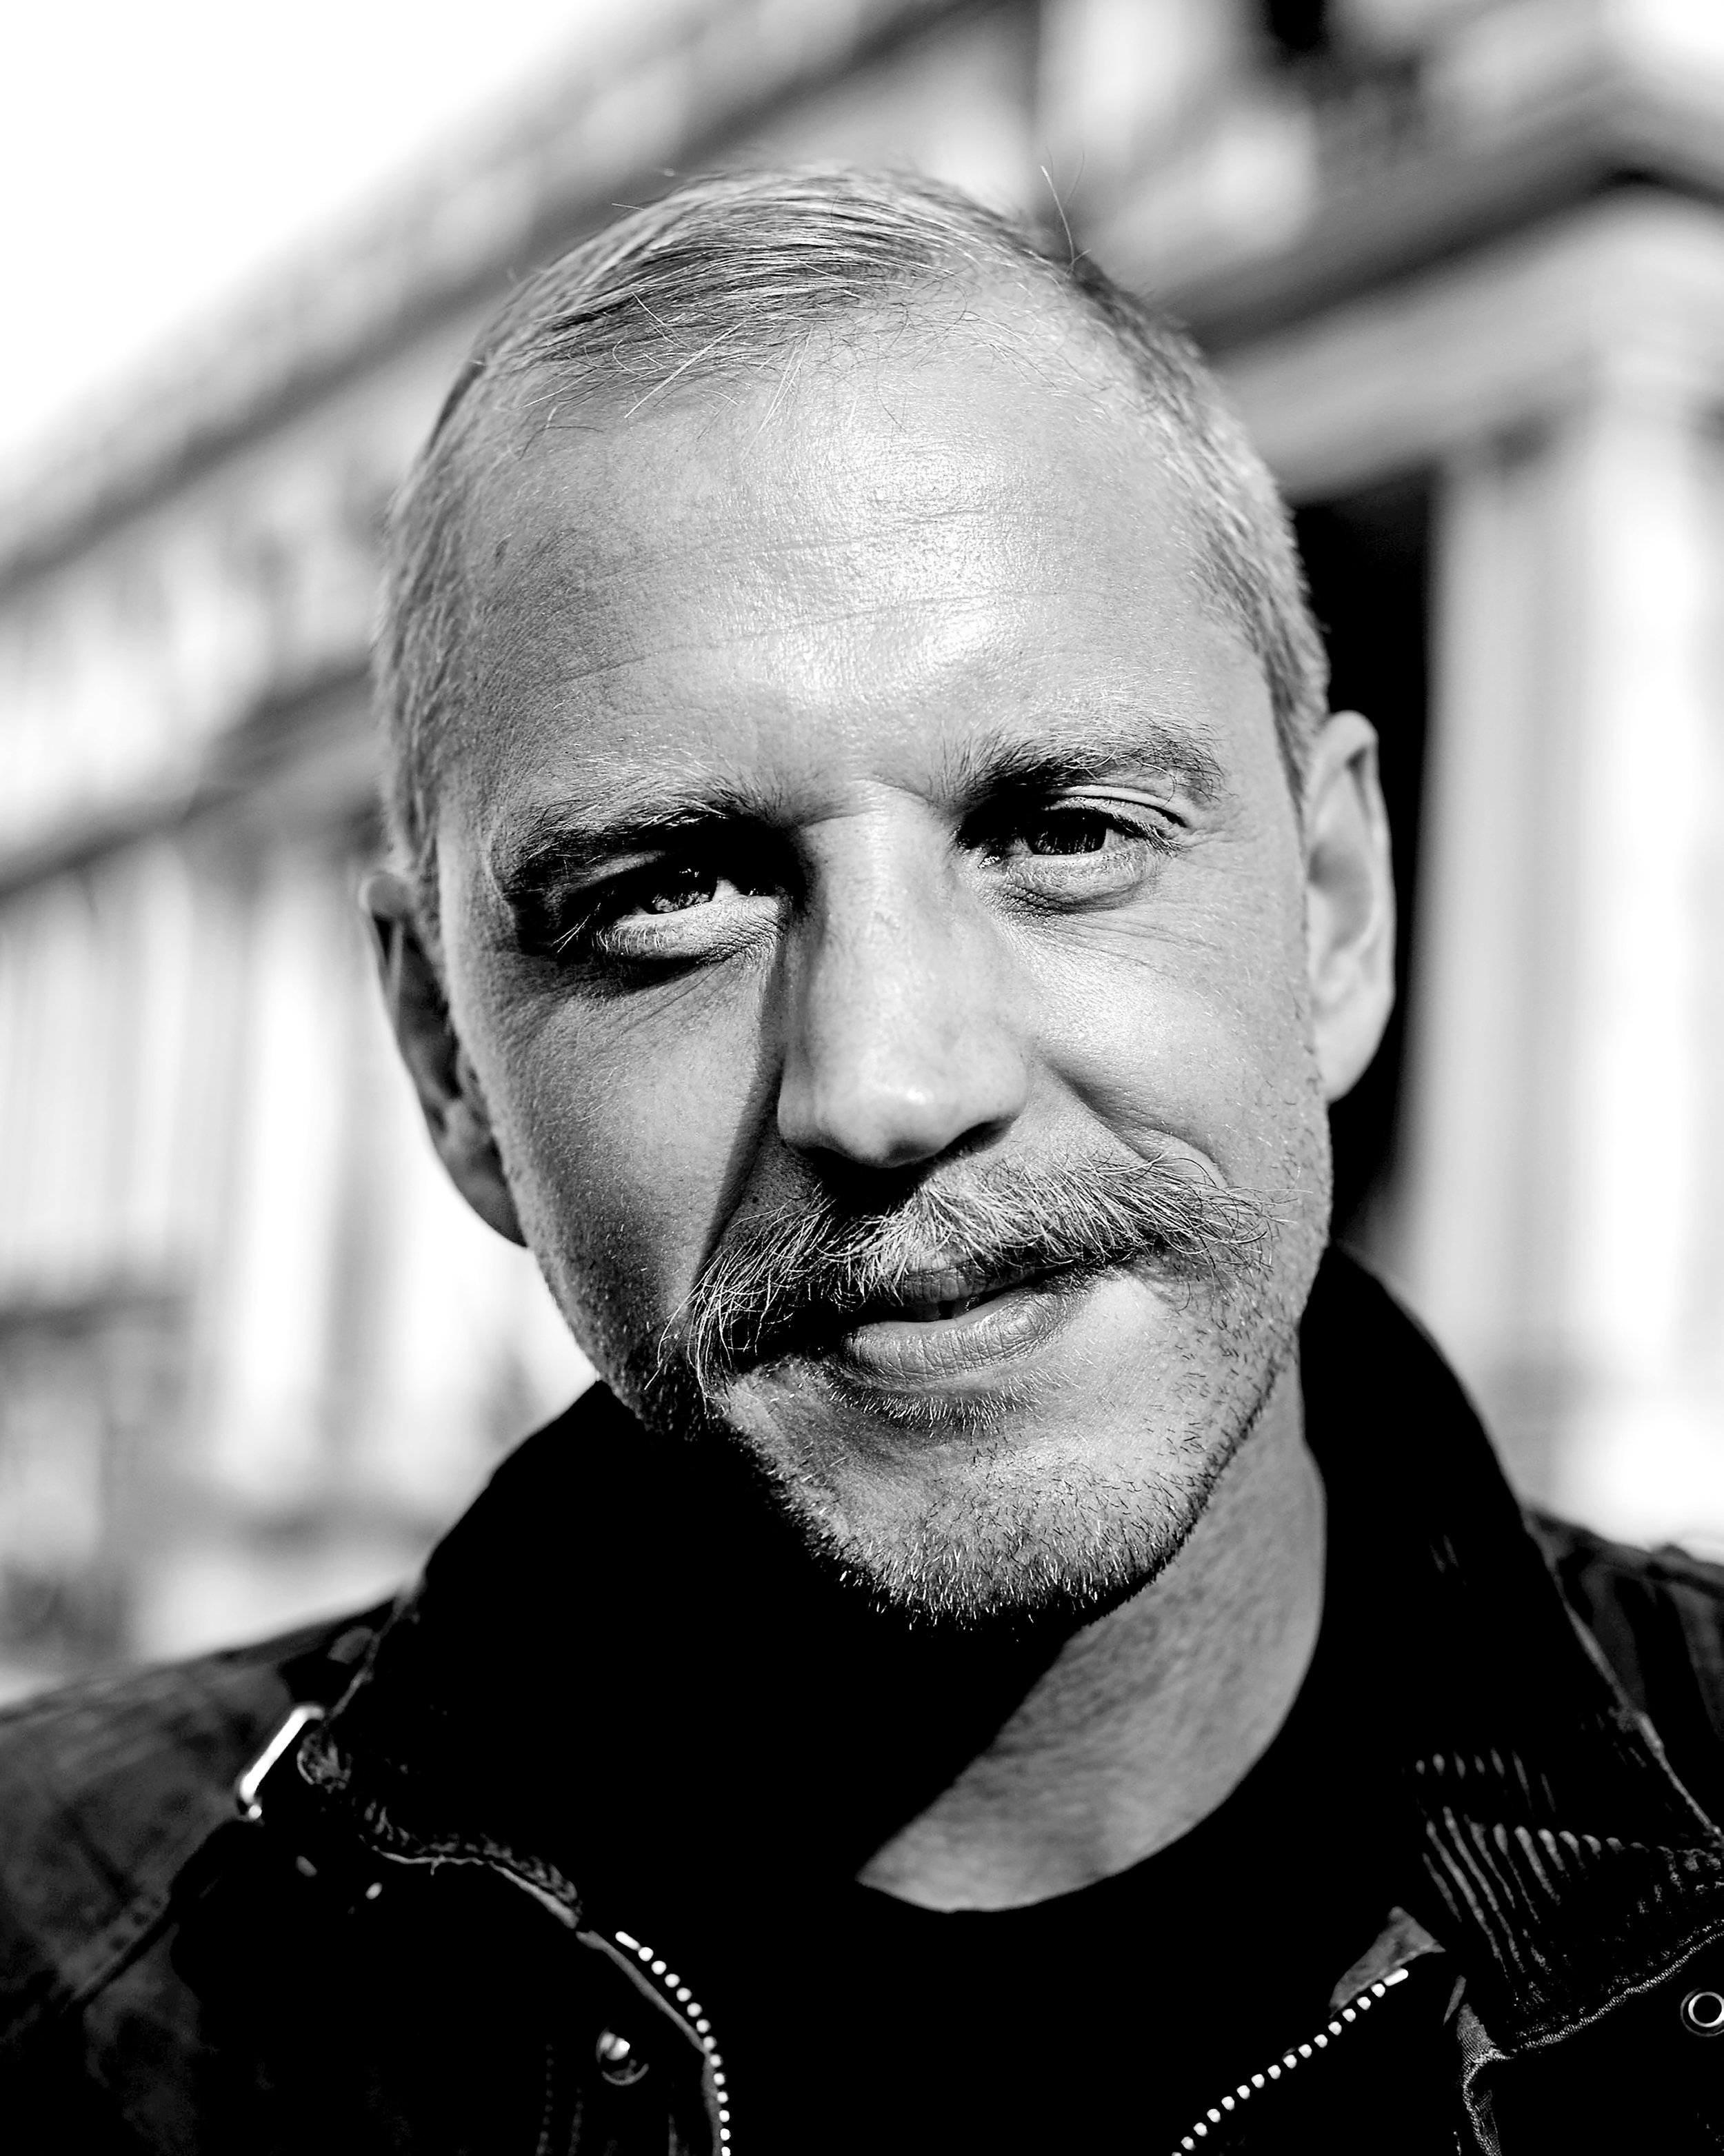 Image: Ben Bowers; Movember Foundation